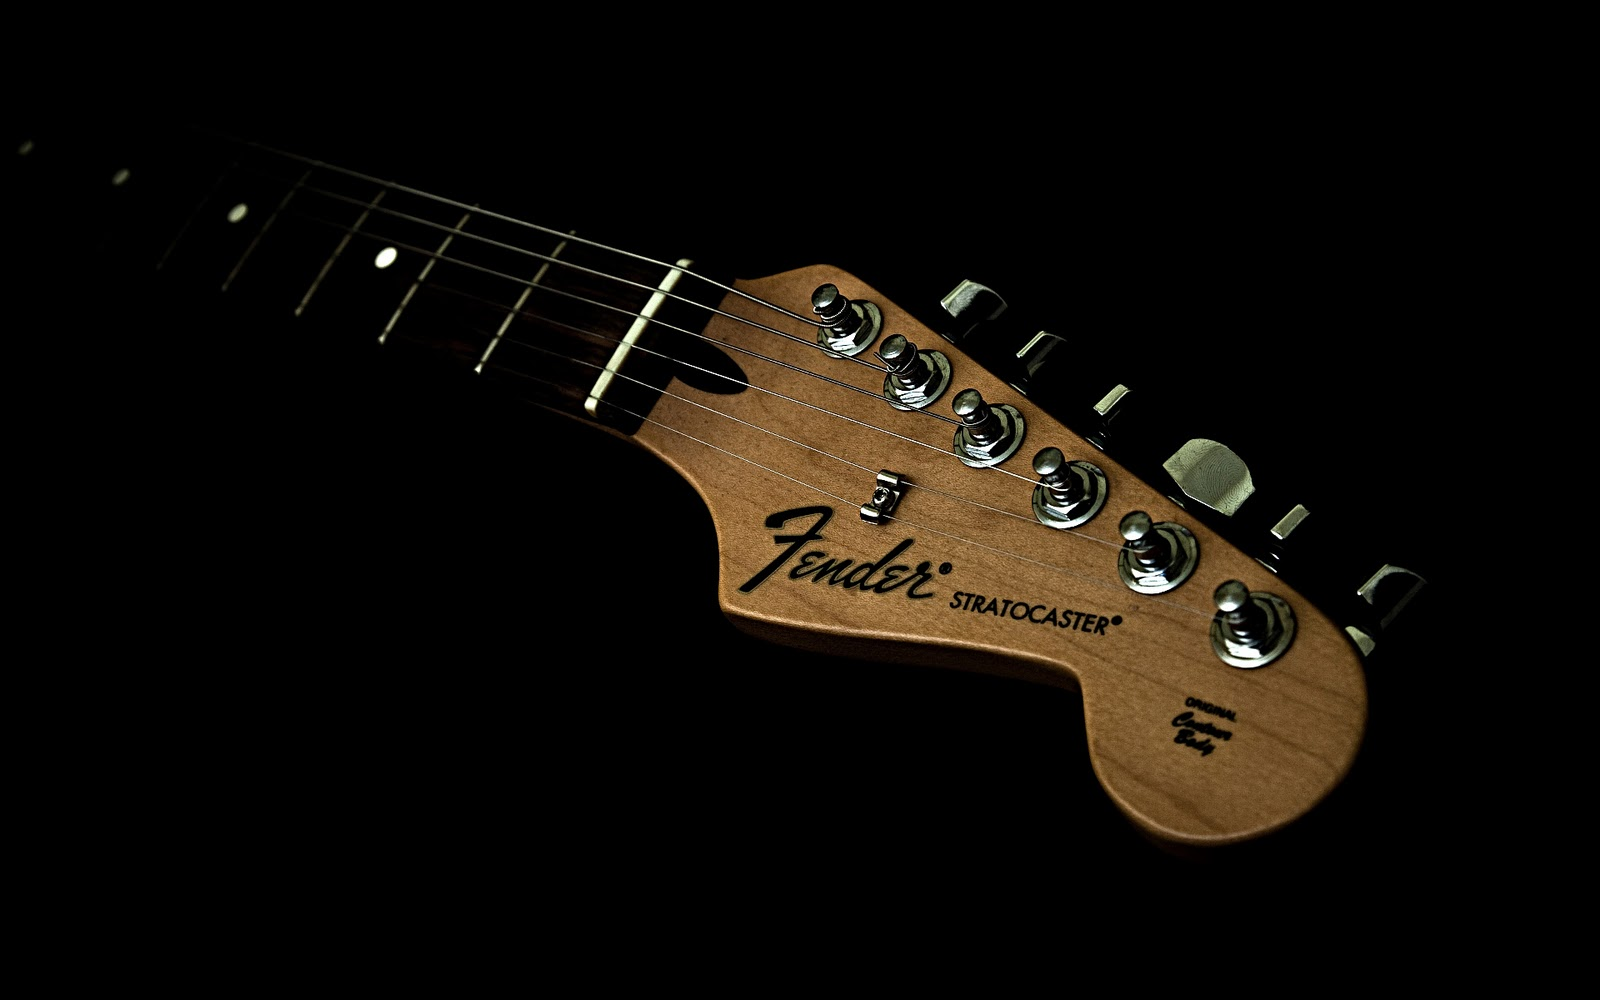 guitar fender stratocaster music - photo #1